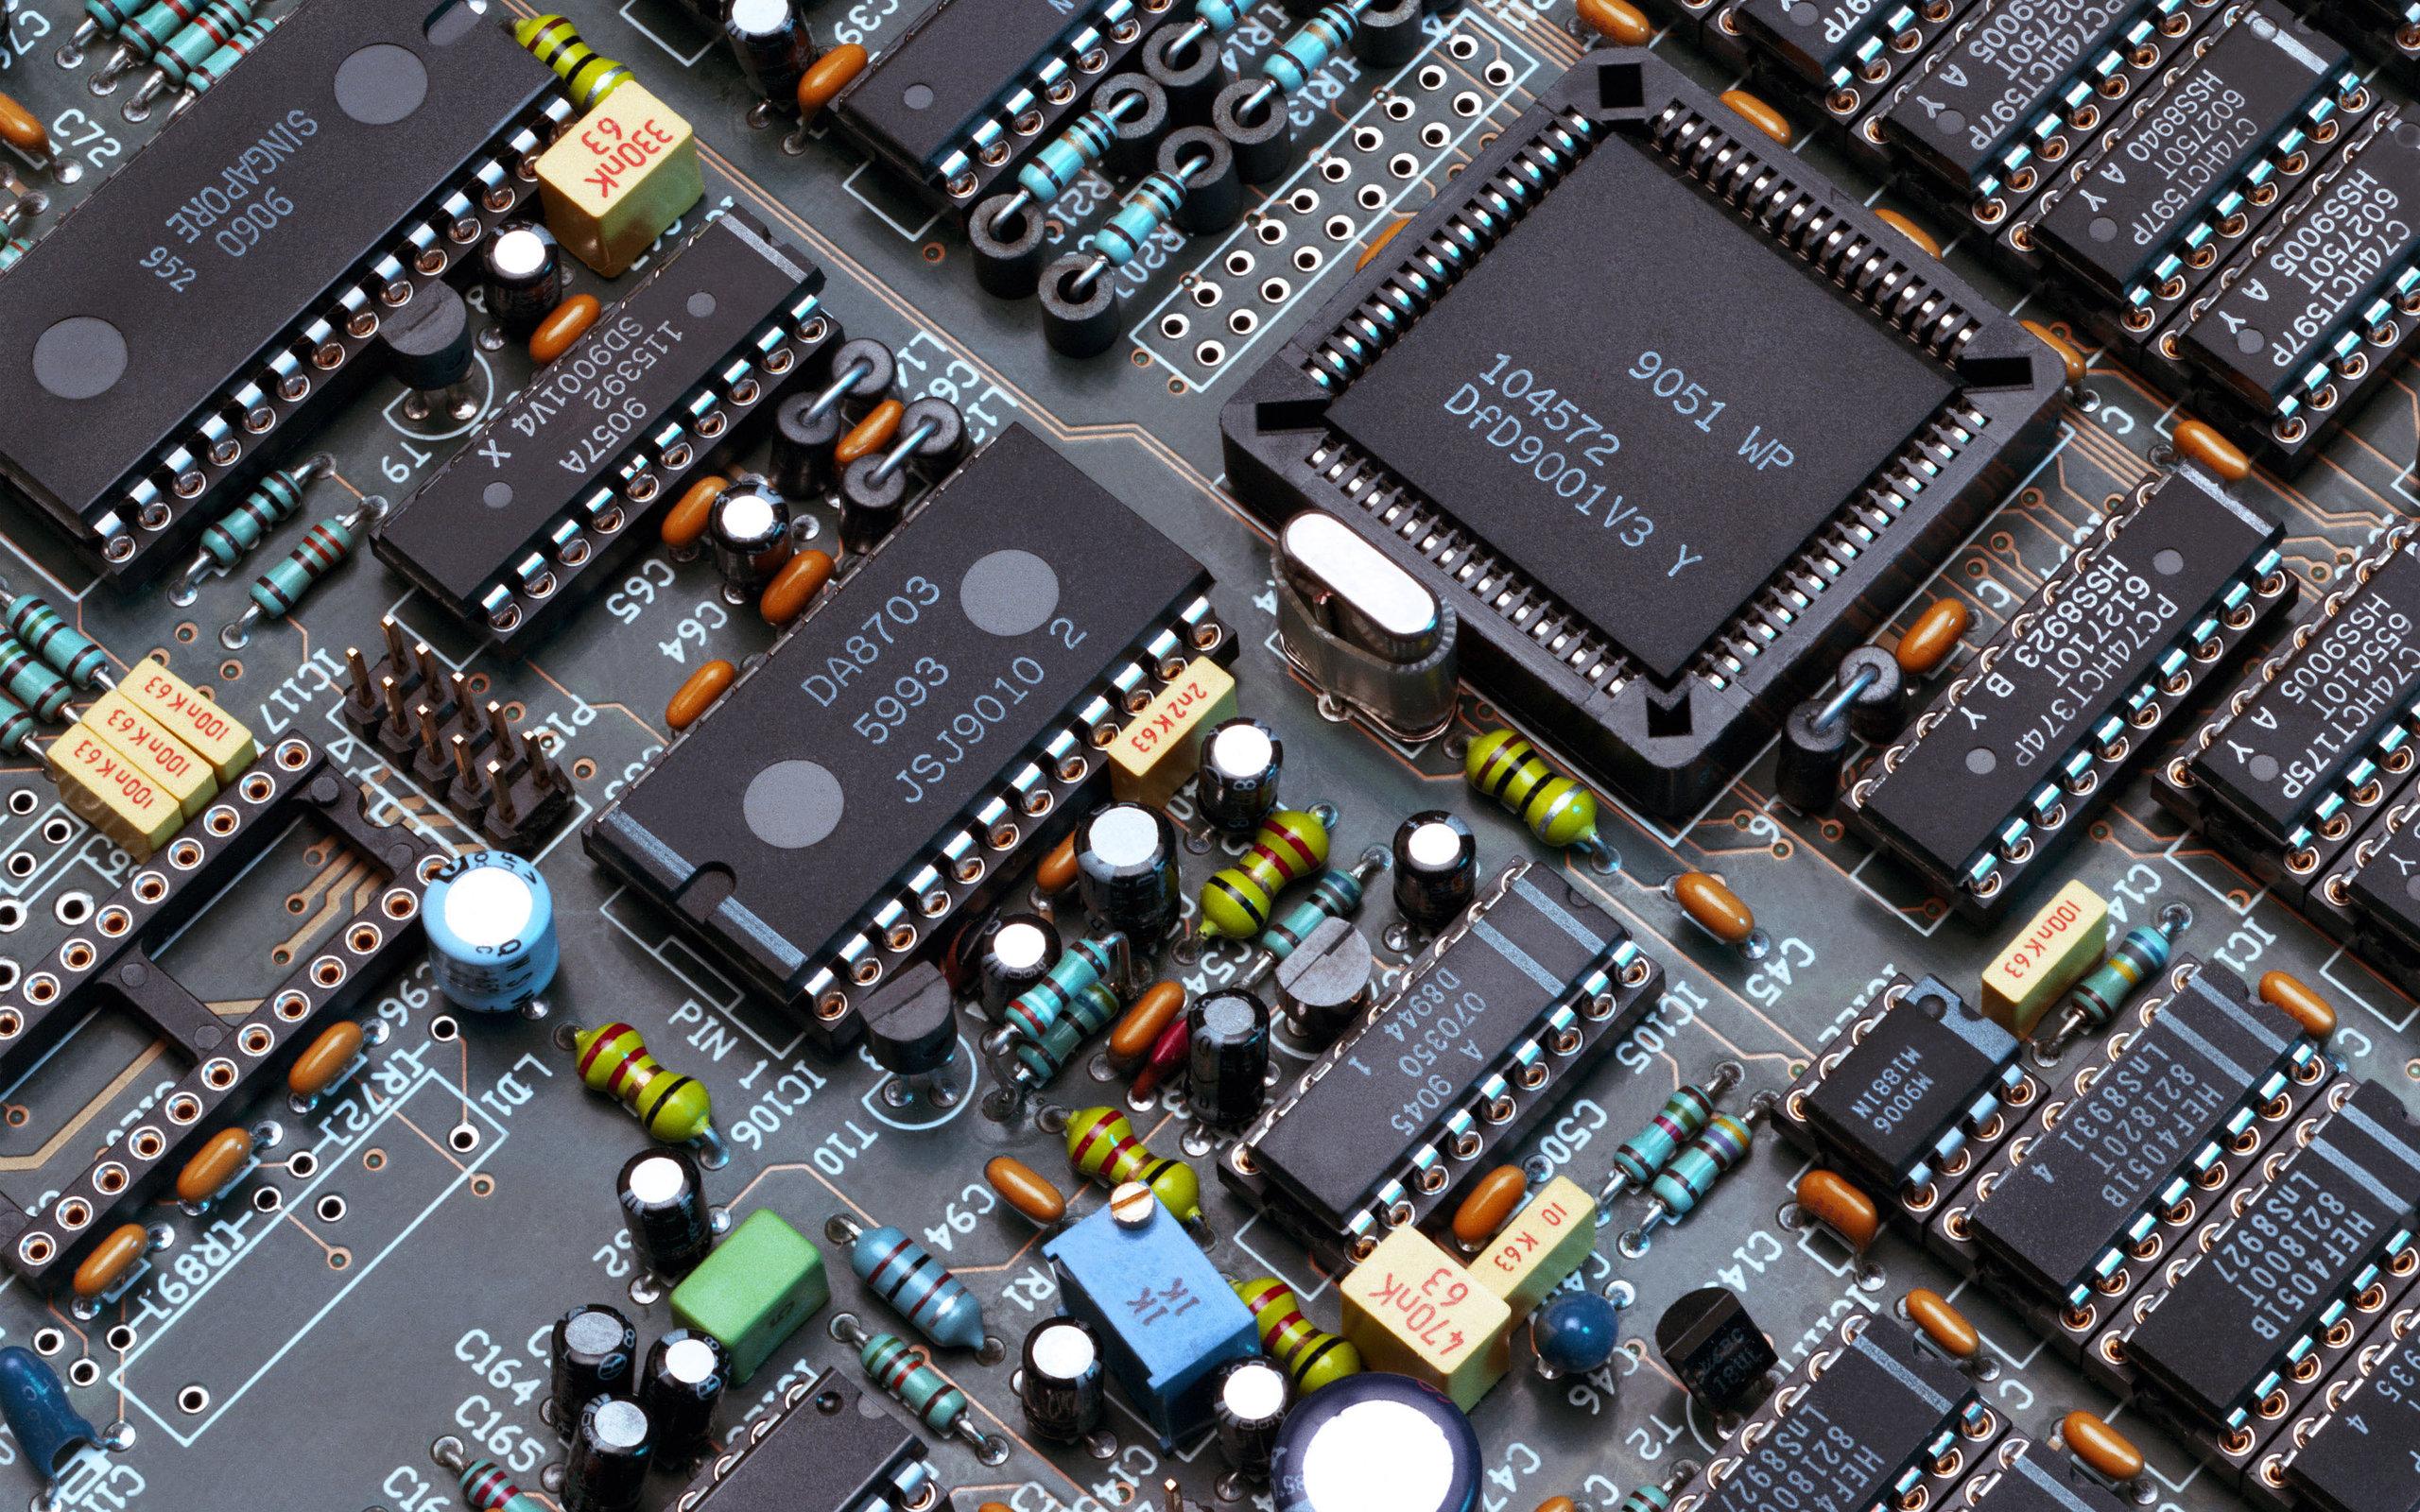 [43+] Circuit Board Wallpapers HD on WallpaperSafari